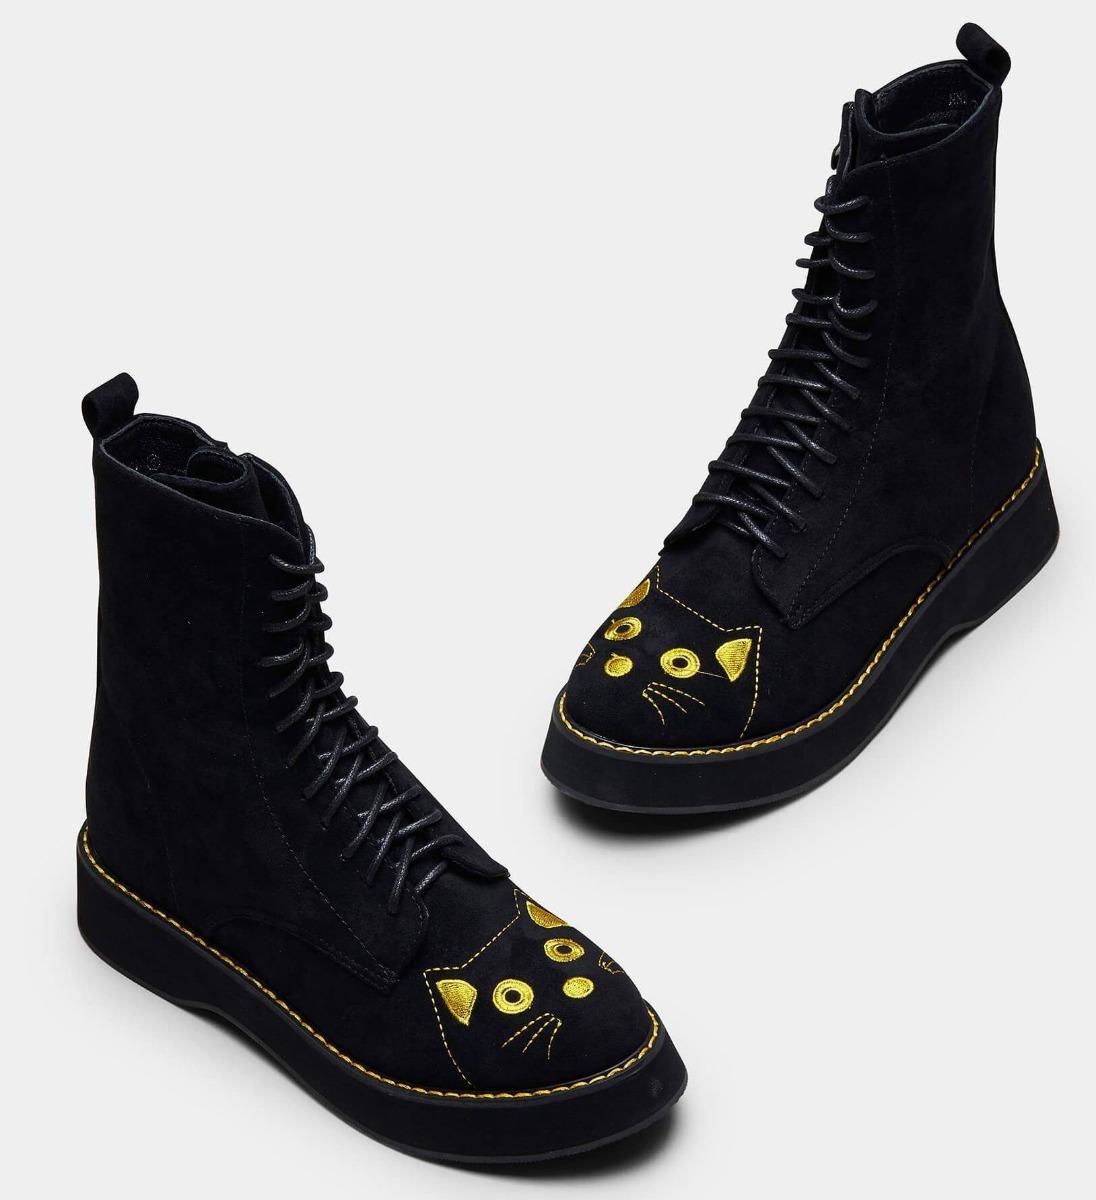 kfnnb3_bottines-boots-gothique-glam-rock-felix-cat